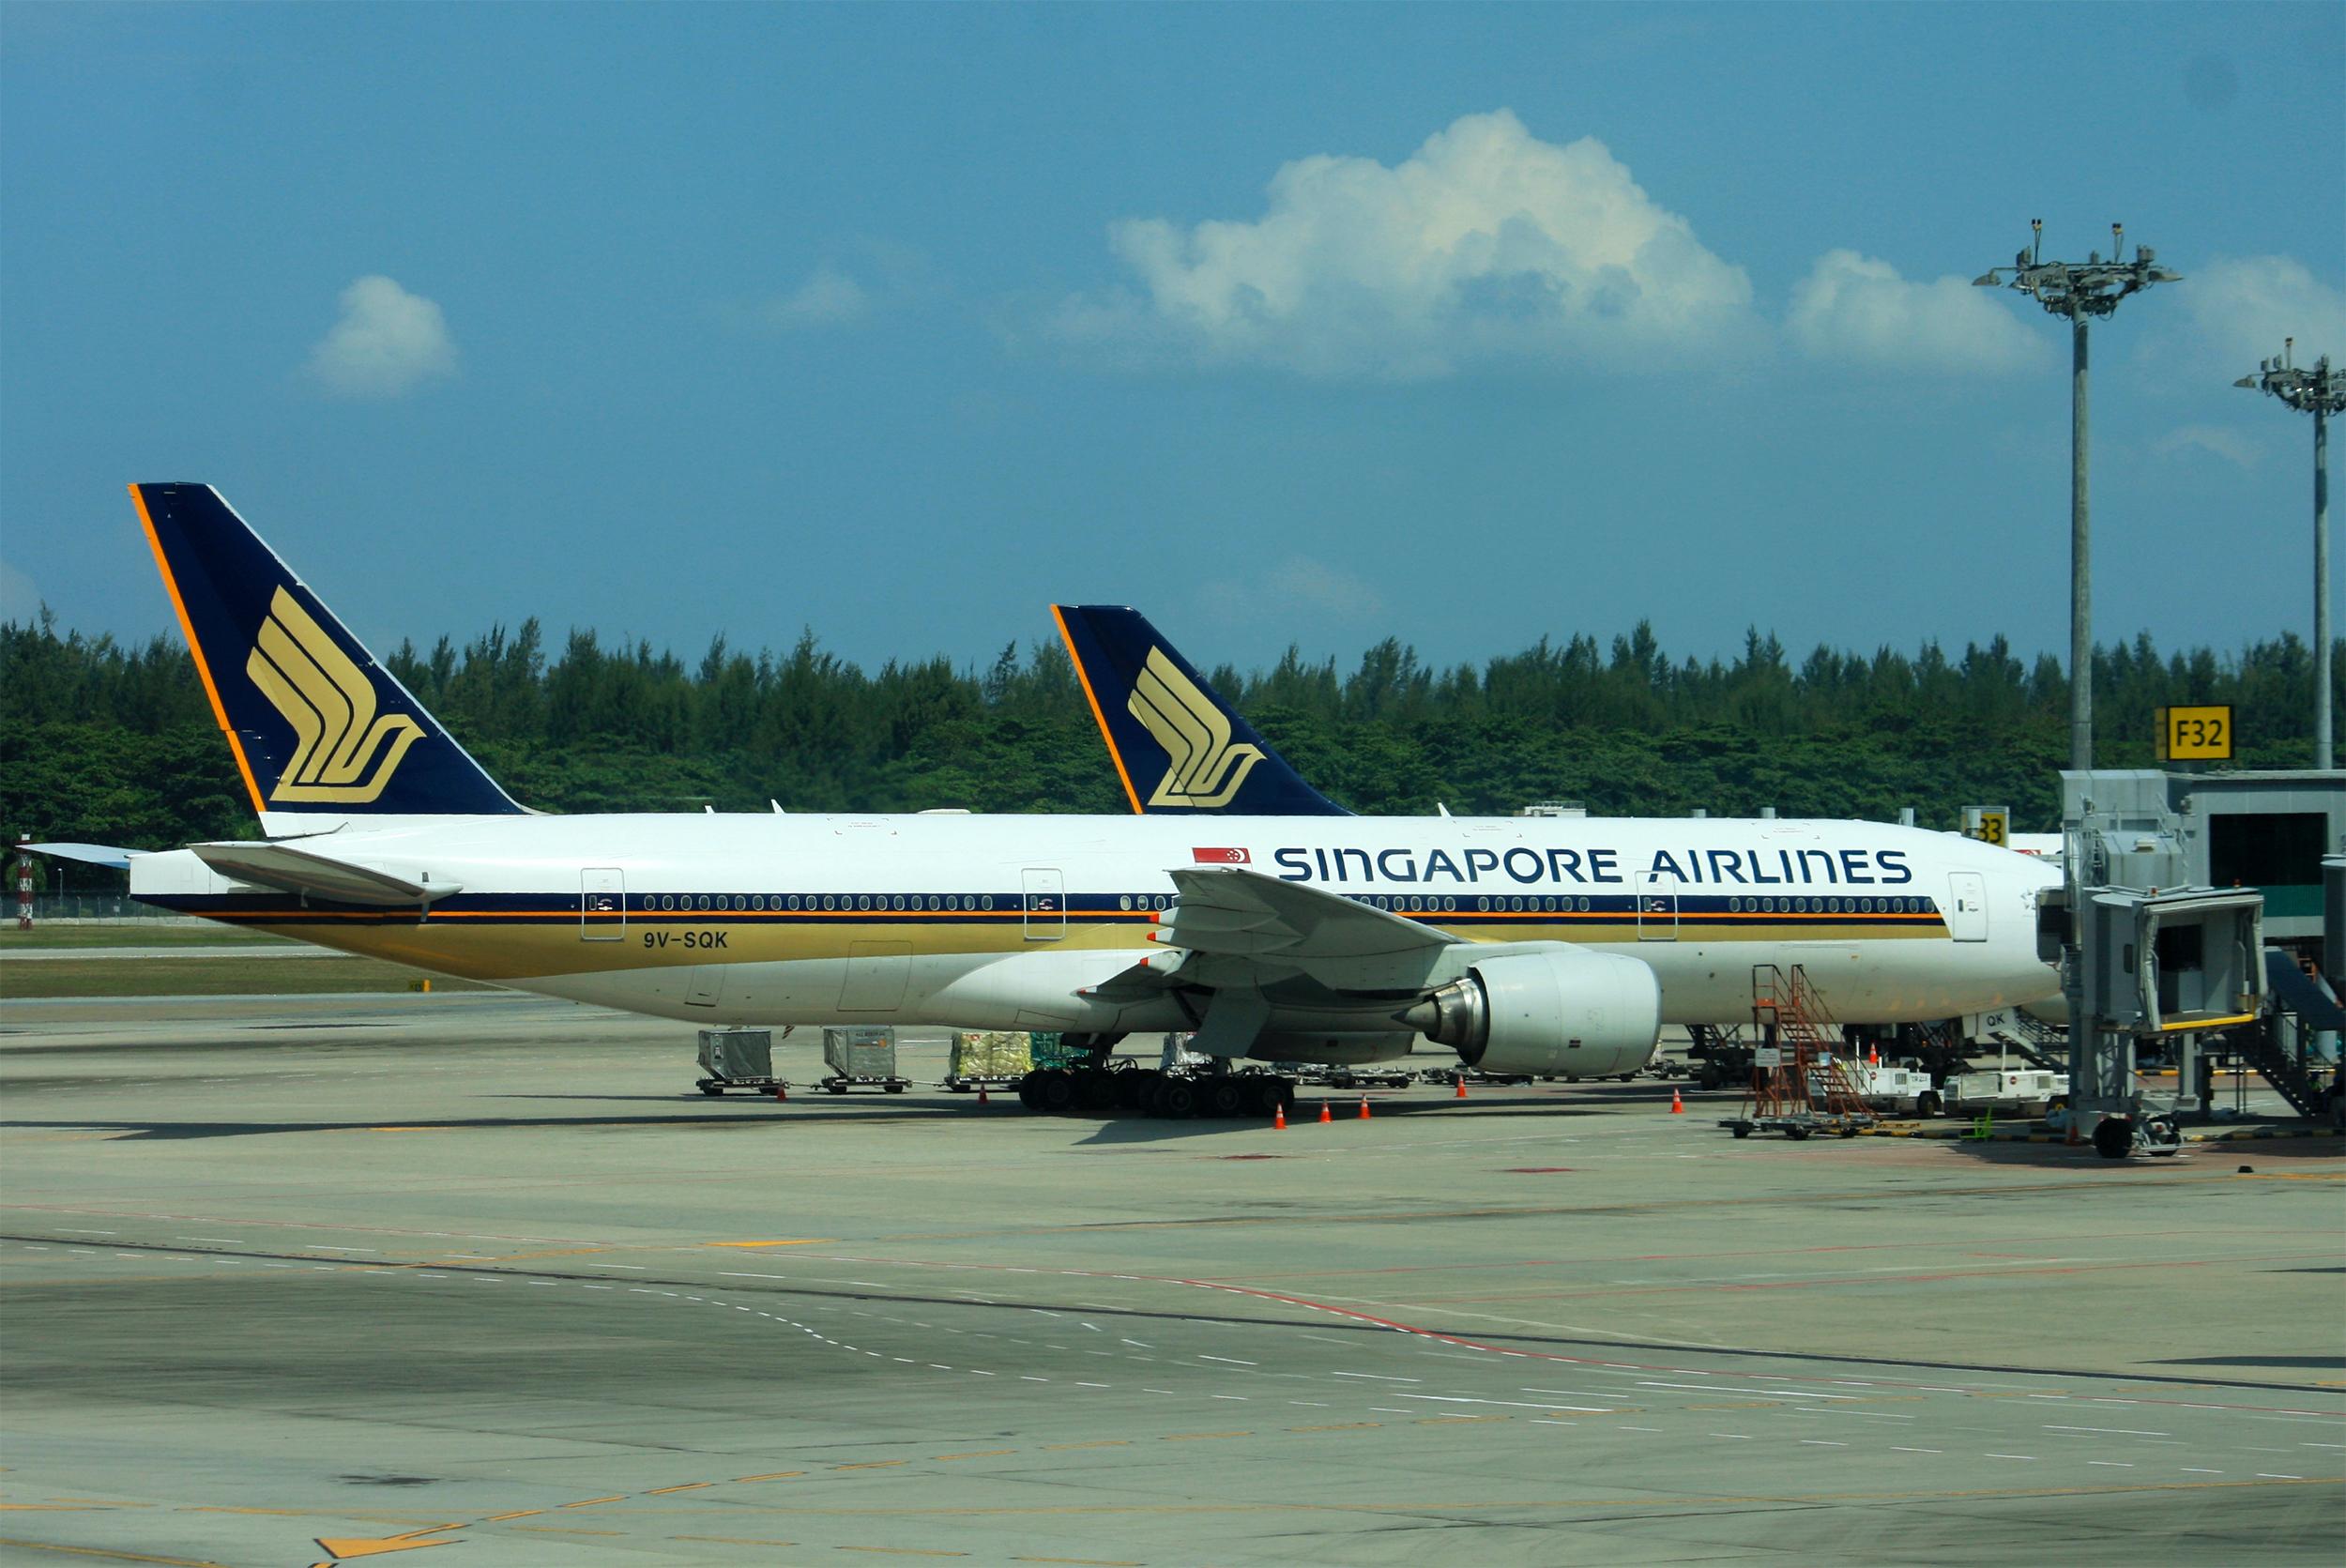 SQ Planes at Changi (Andrew Thomas)